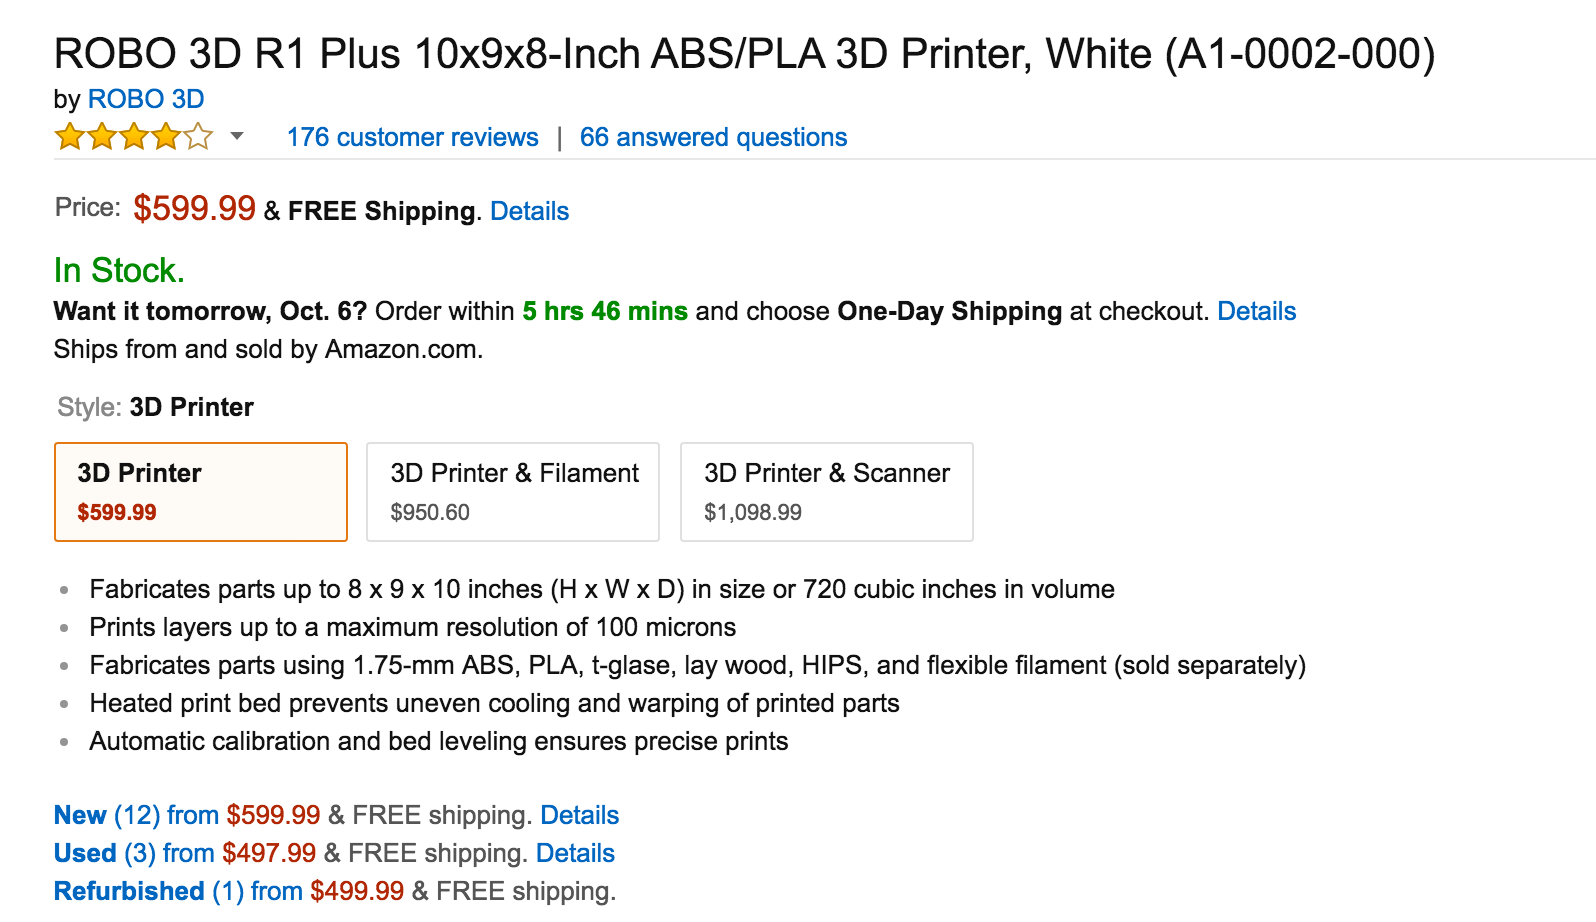 robo-3d-r1-plus-abspla-3d-printer-5